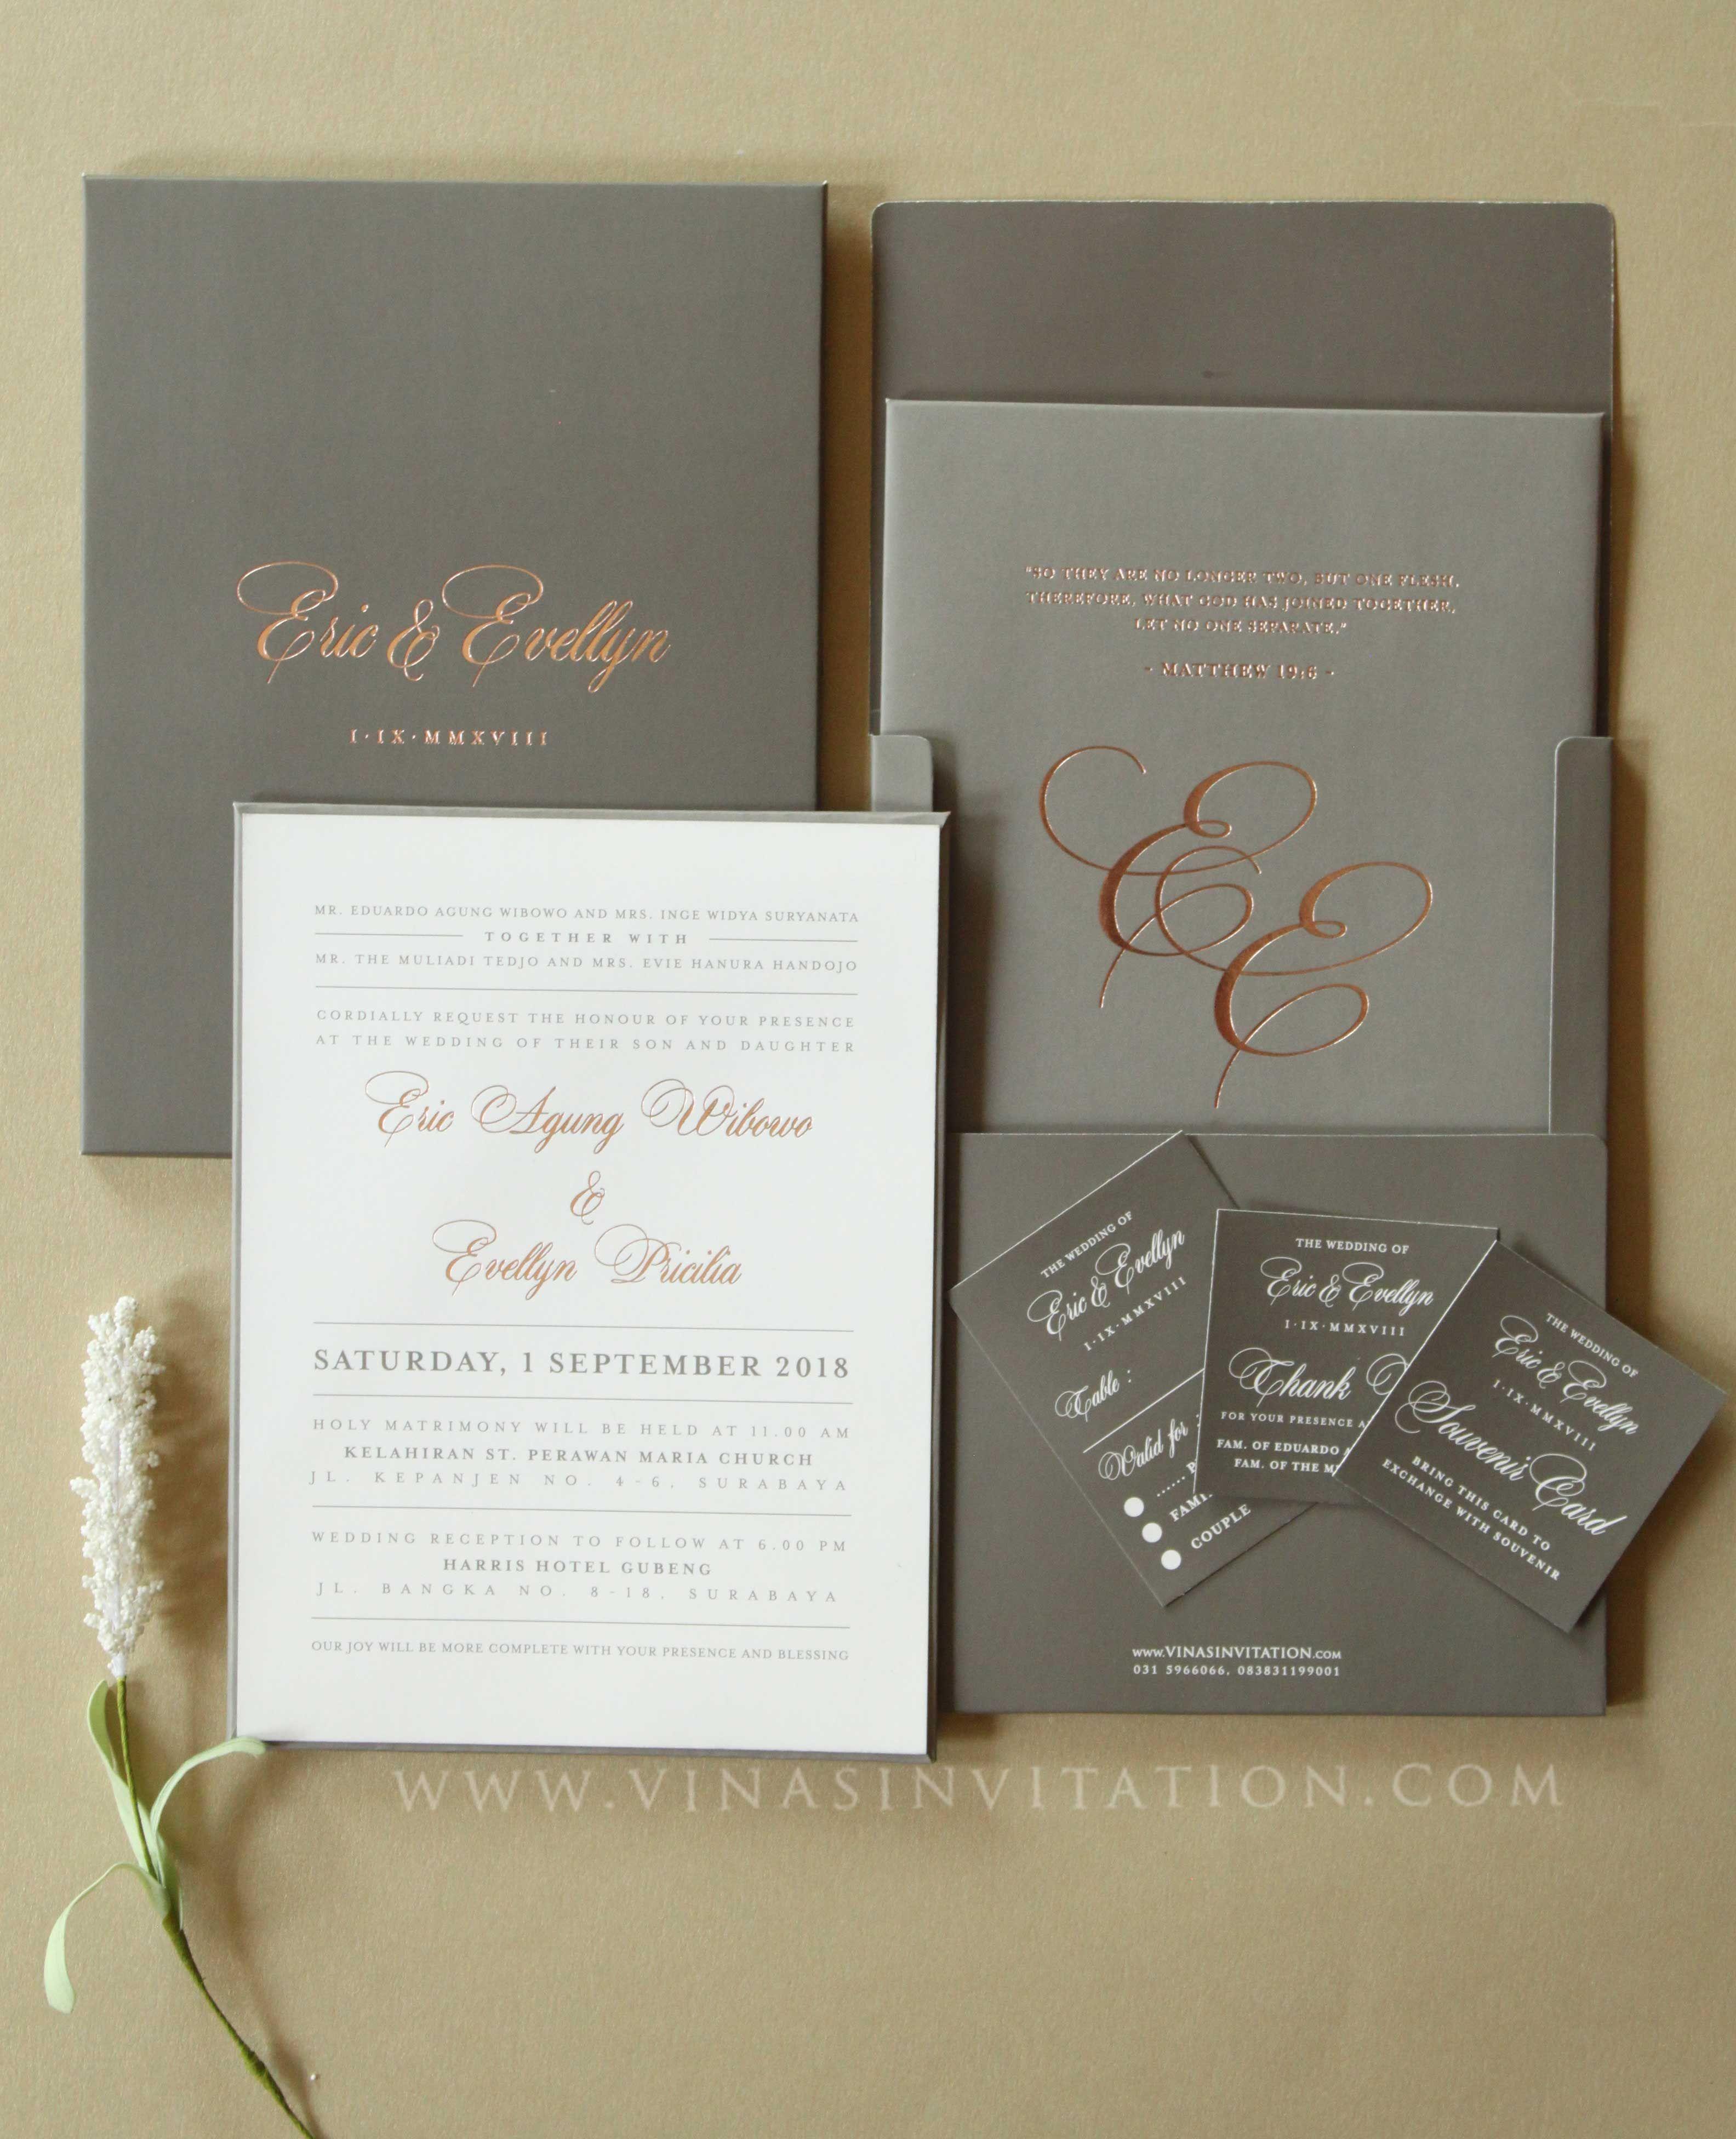 Vinas Invitation Simple Elegant Wedding Invitation Sydney Wedding Invitation Australia Wedding Invitation G Kartu Pernikahan Undangan Pernikahan Perkawinan